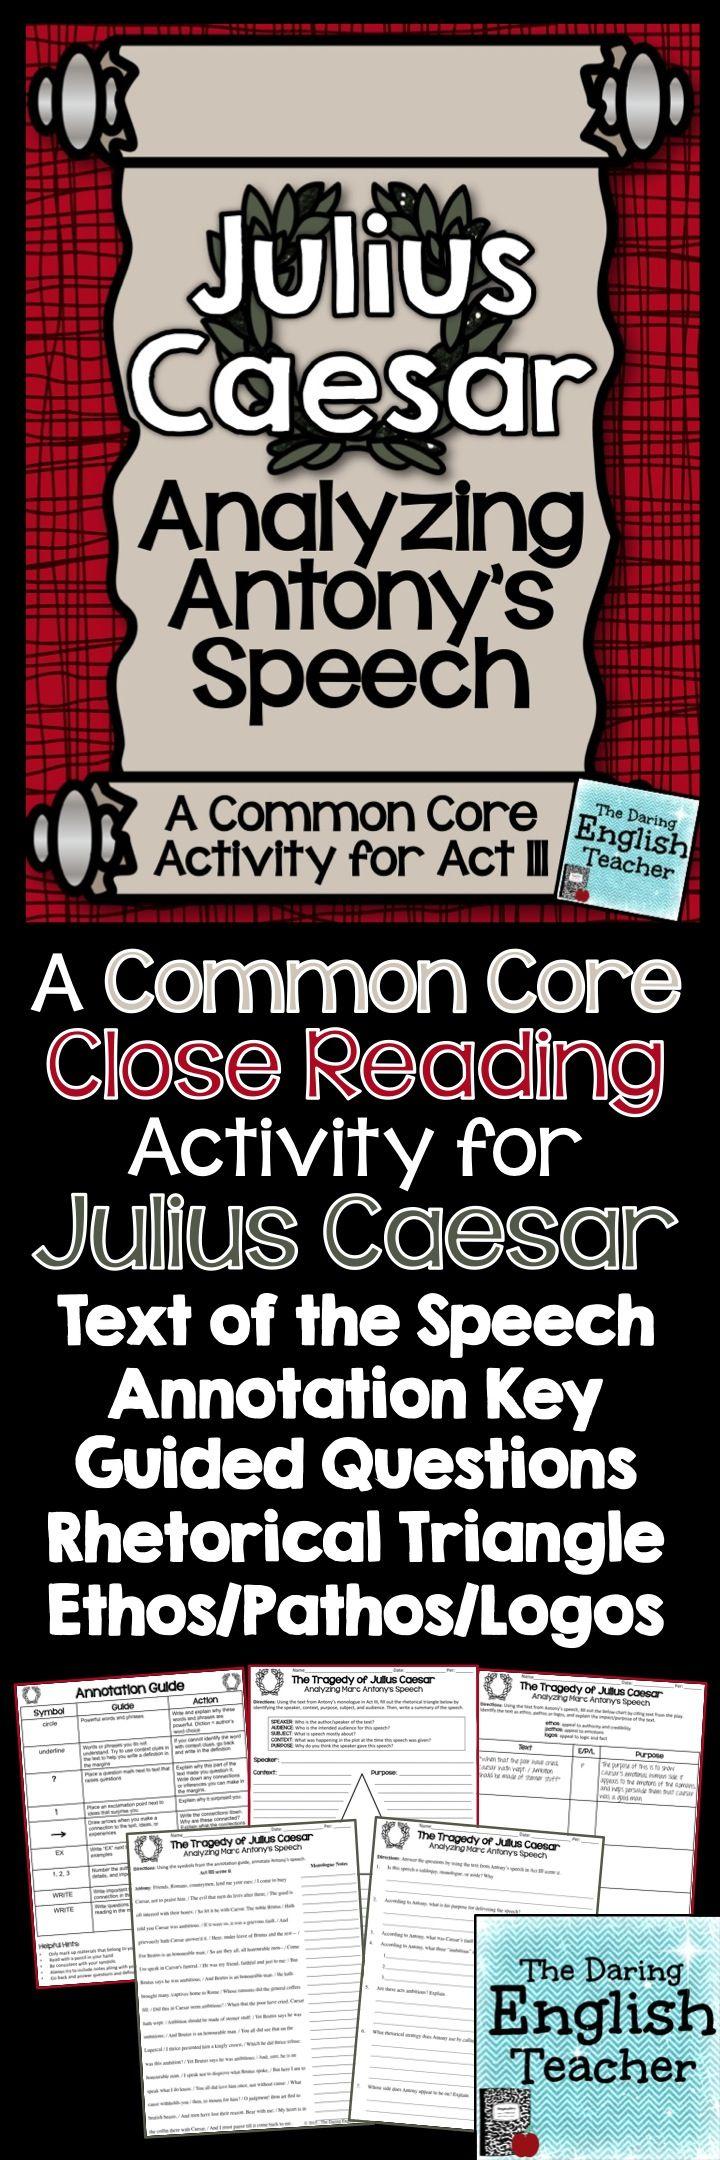 Julius Caesar Close Reading Analyzing Antony S Speech Teaching